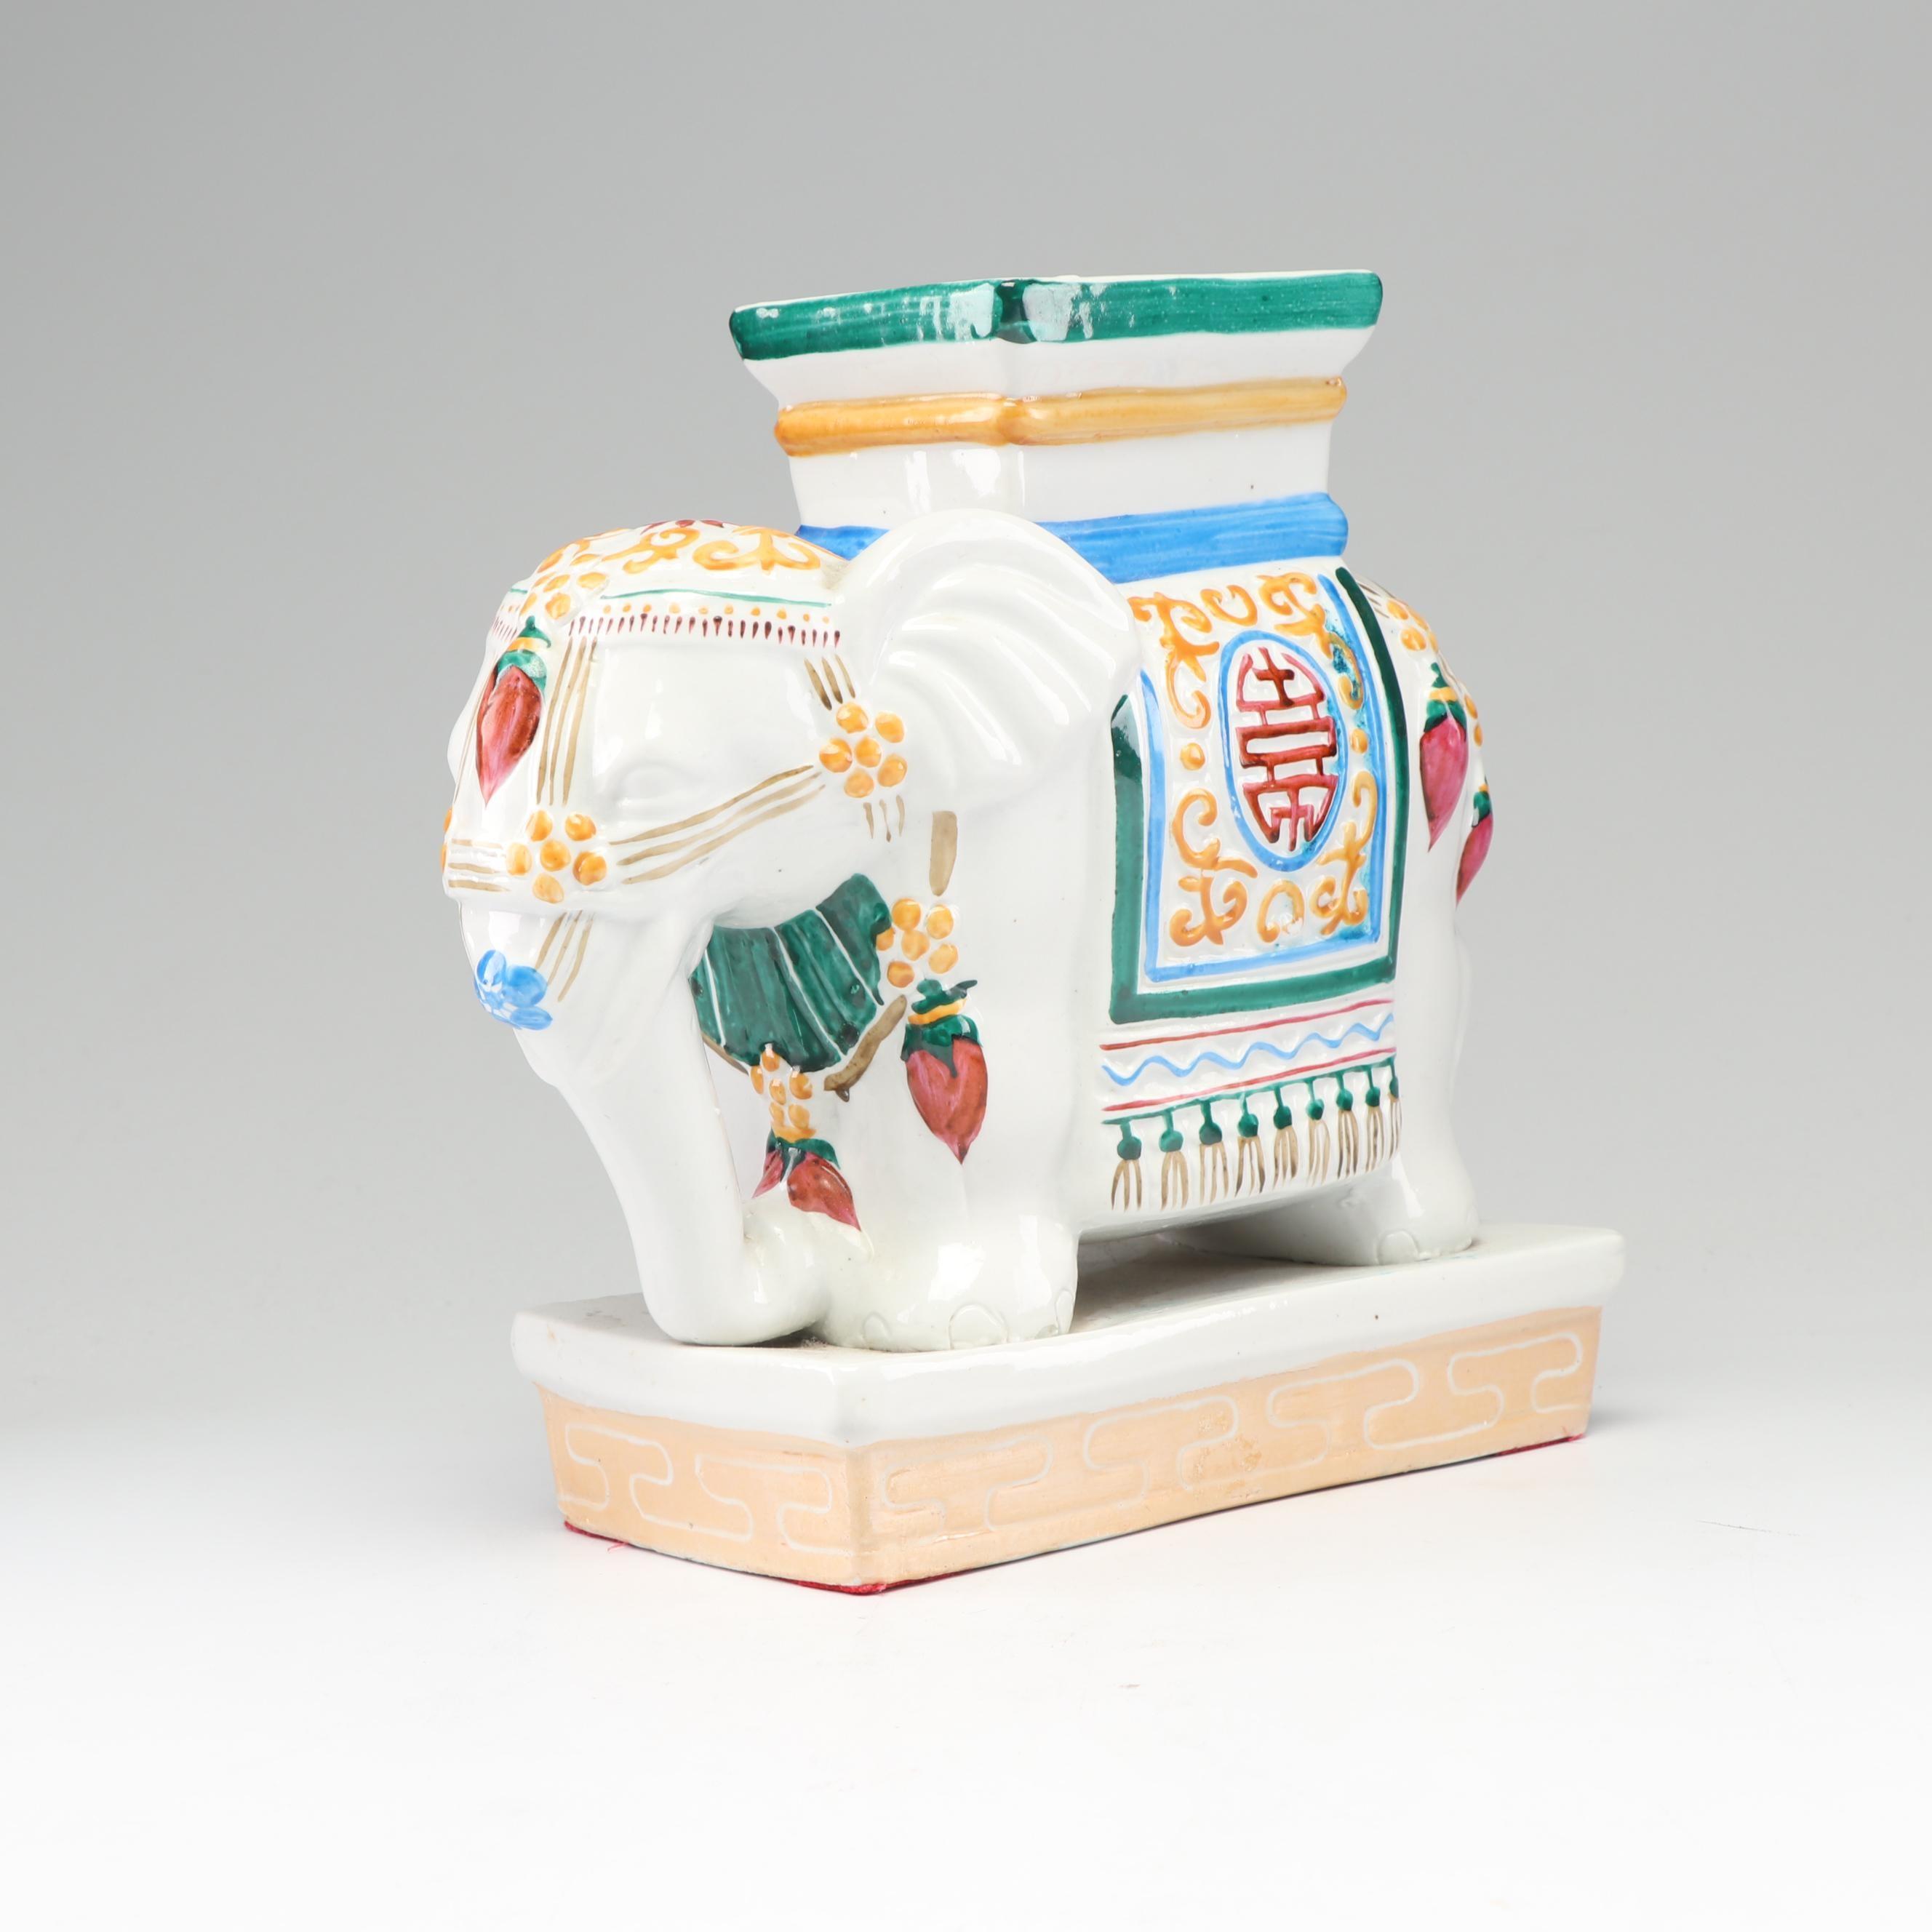 Vintage Chinese Hand-Painted Ceramic Elephant Figurine